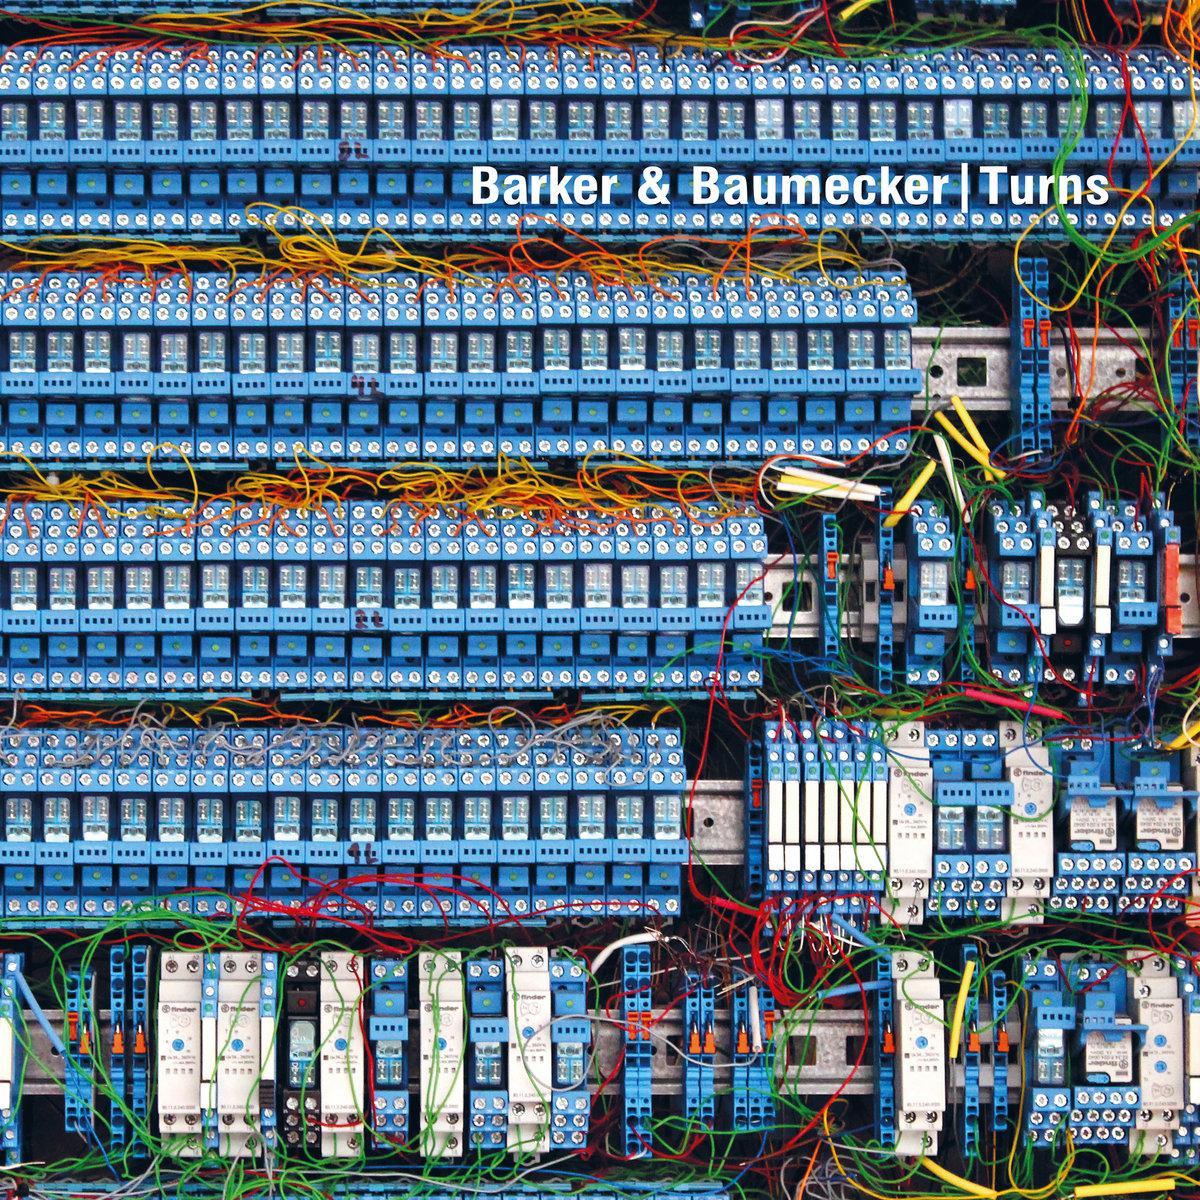 BARKER & BAUMECKER - TURNS (OSTGUT TON, 2016)